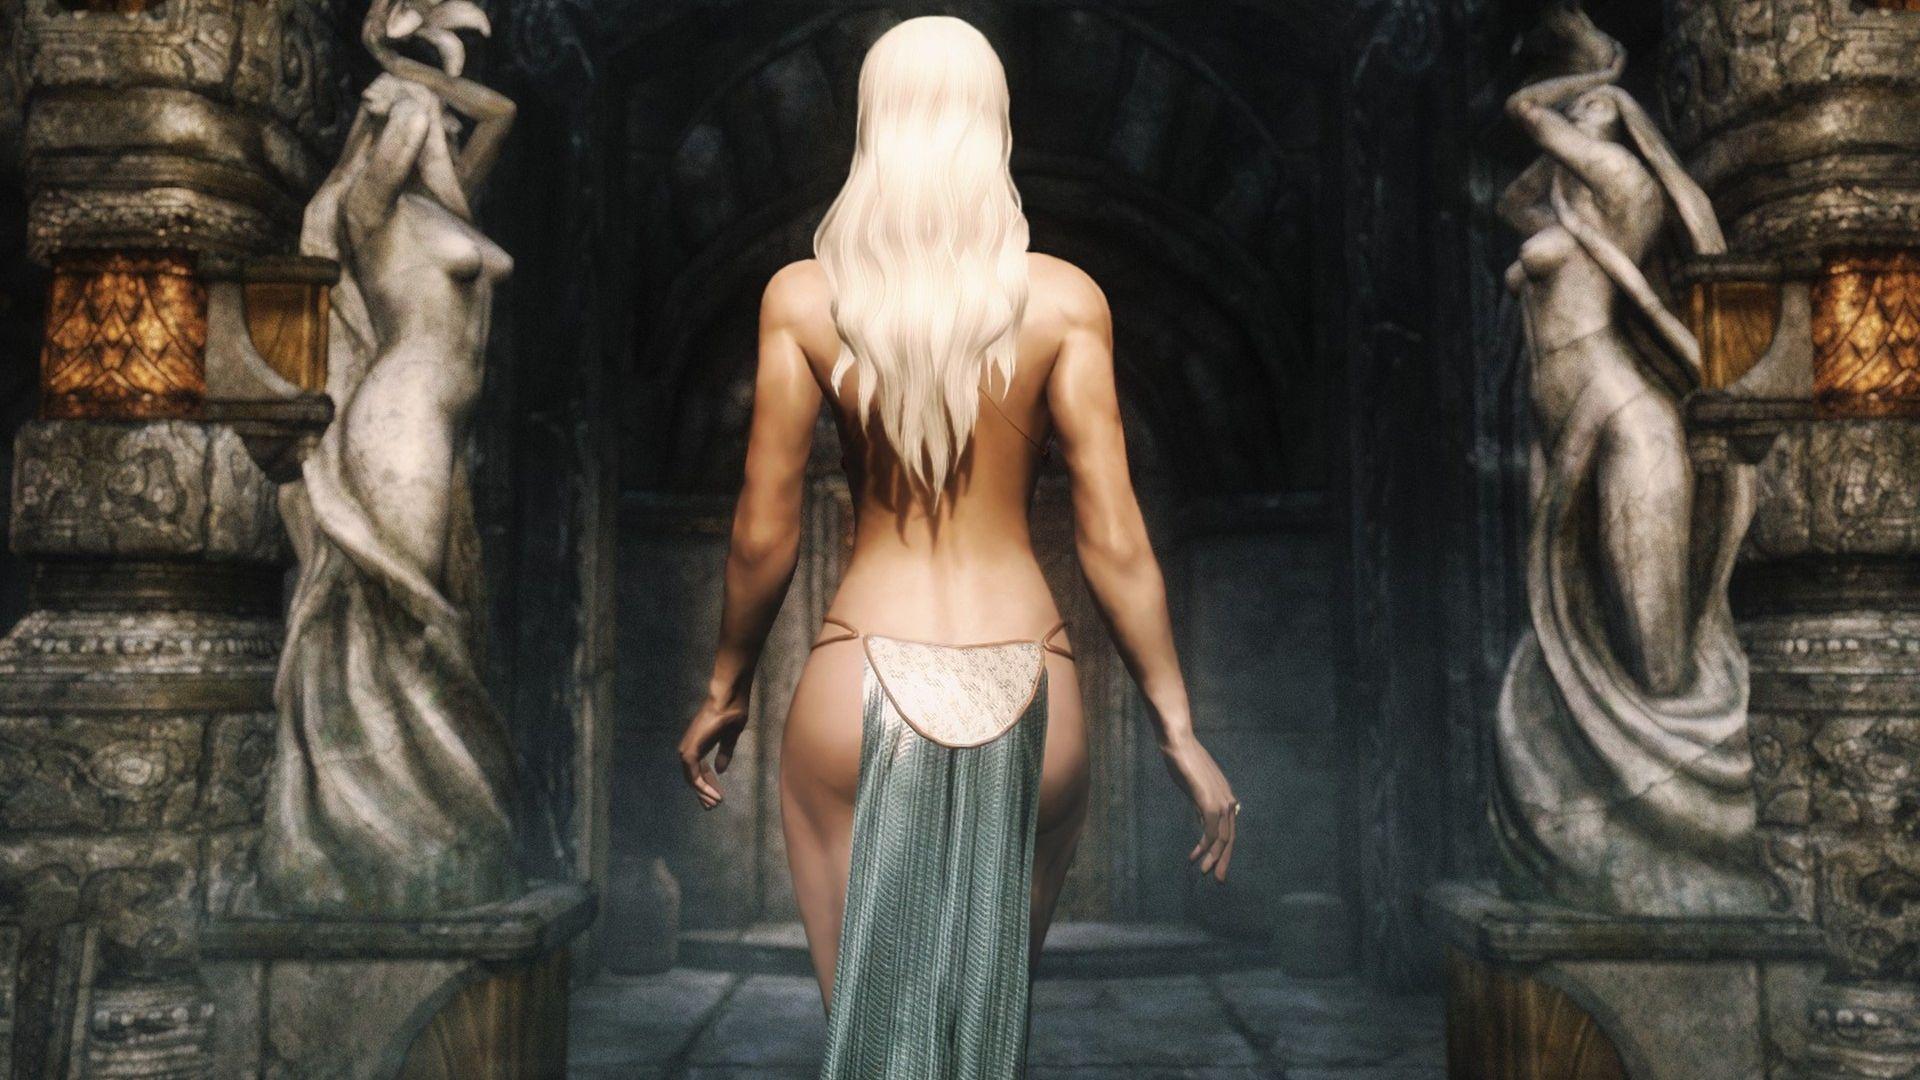 Dibella Follower  Elder Scrolls Online, Skyrim, Elder -8020